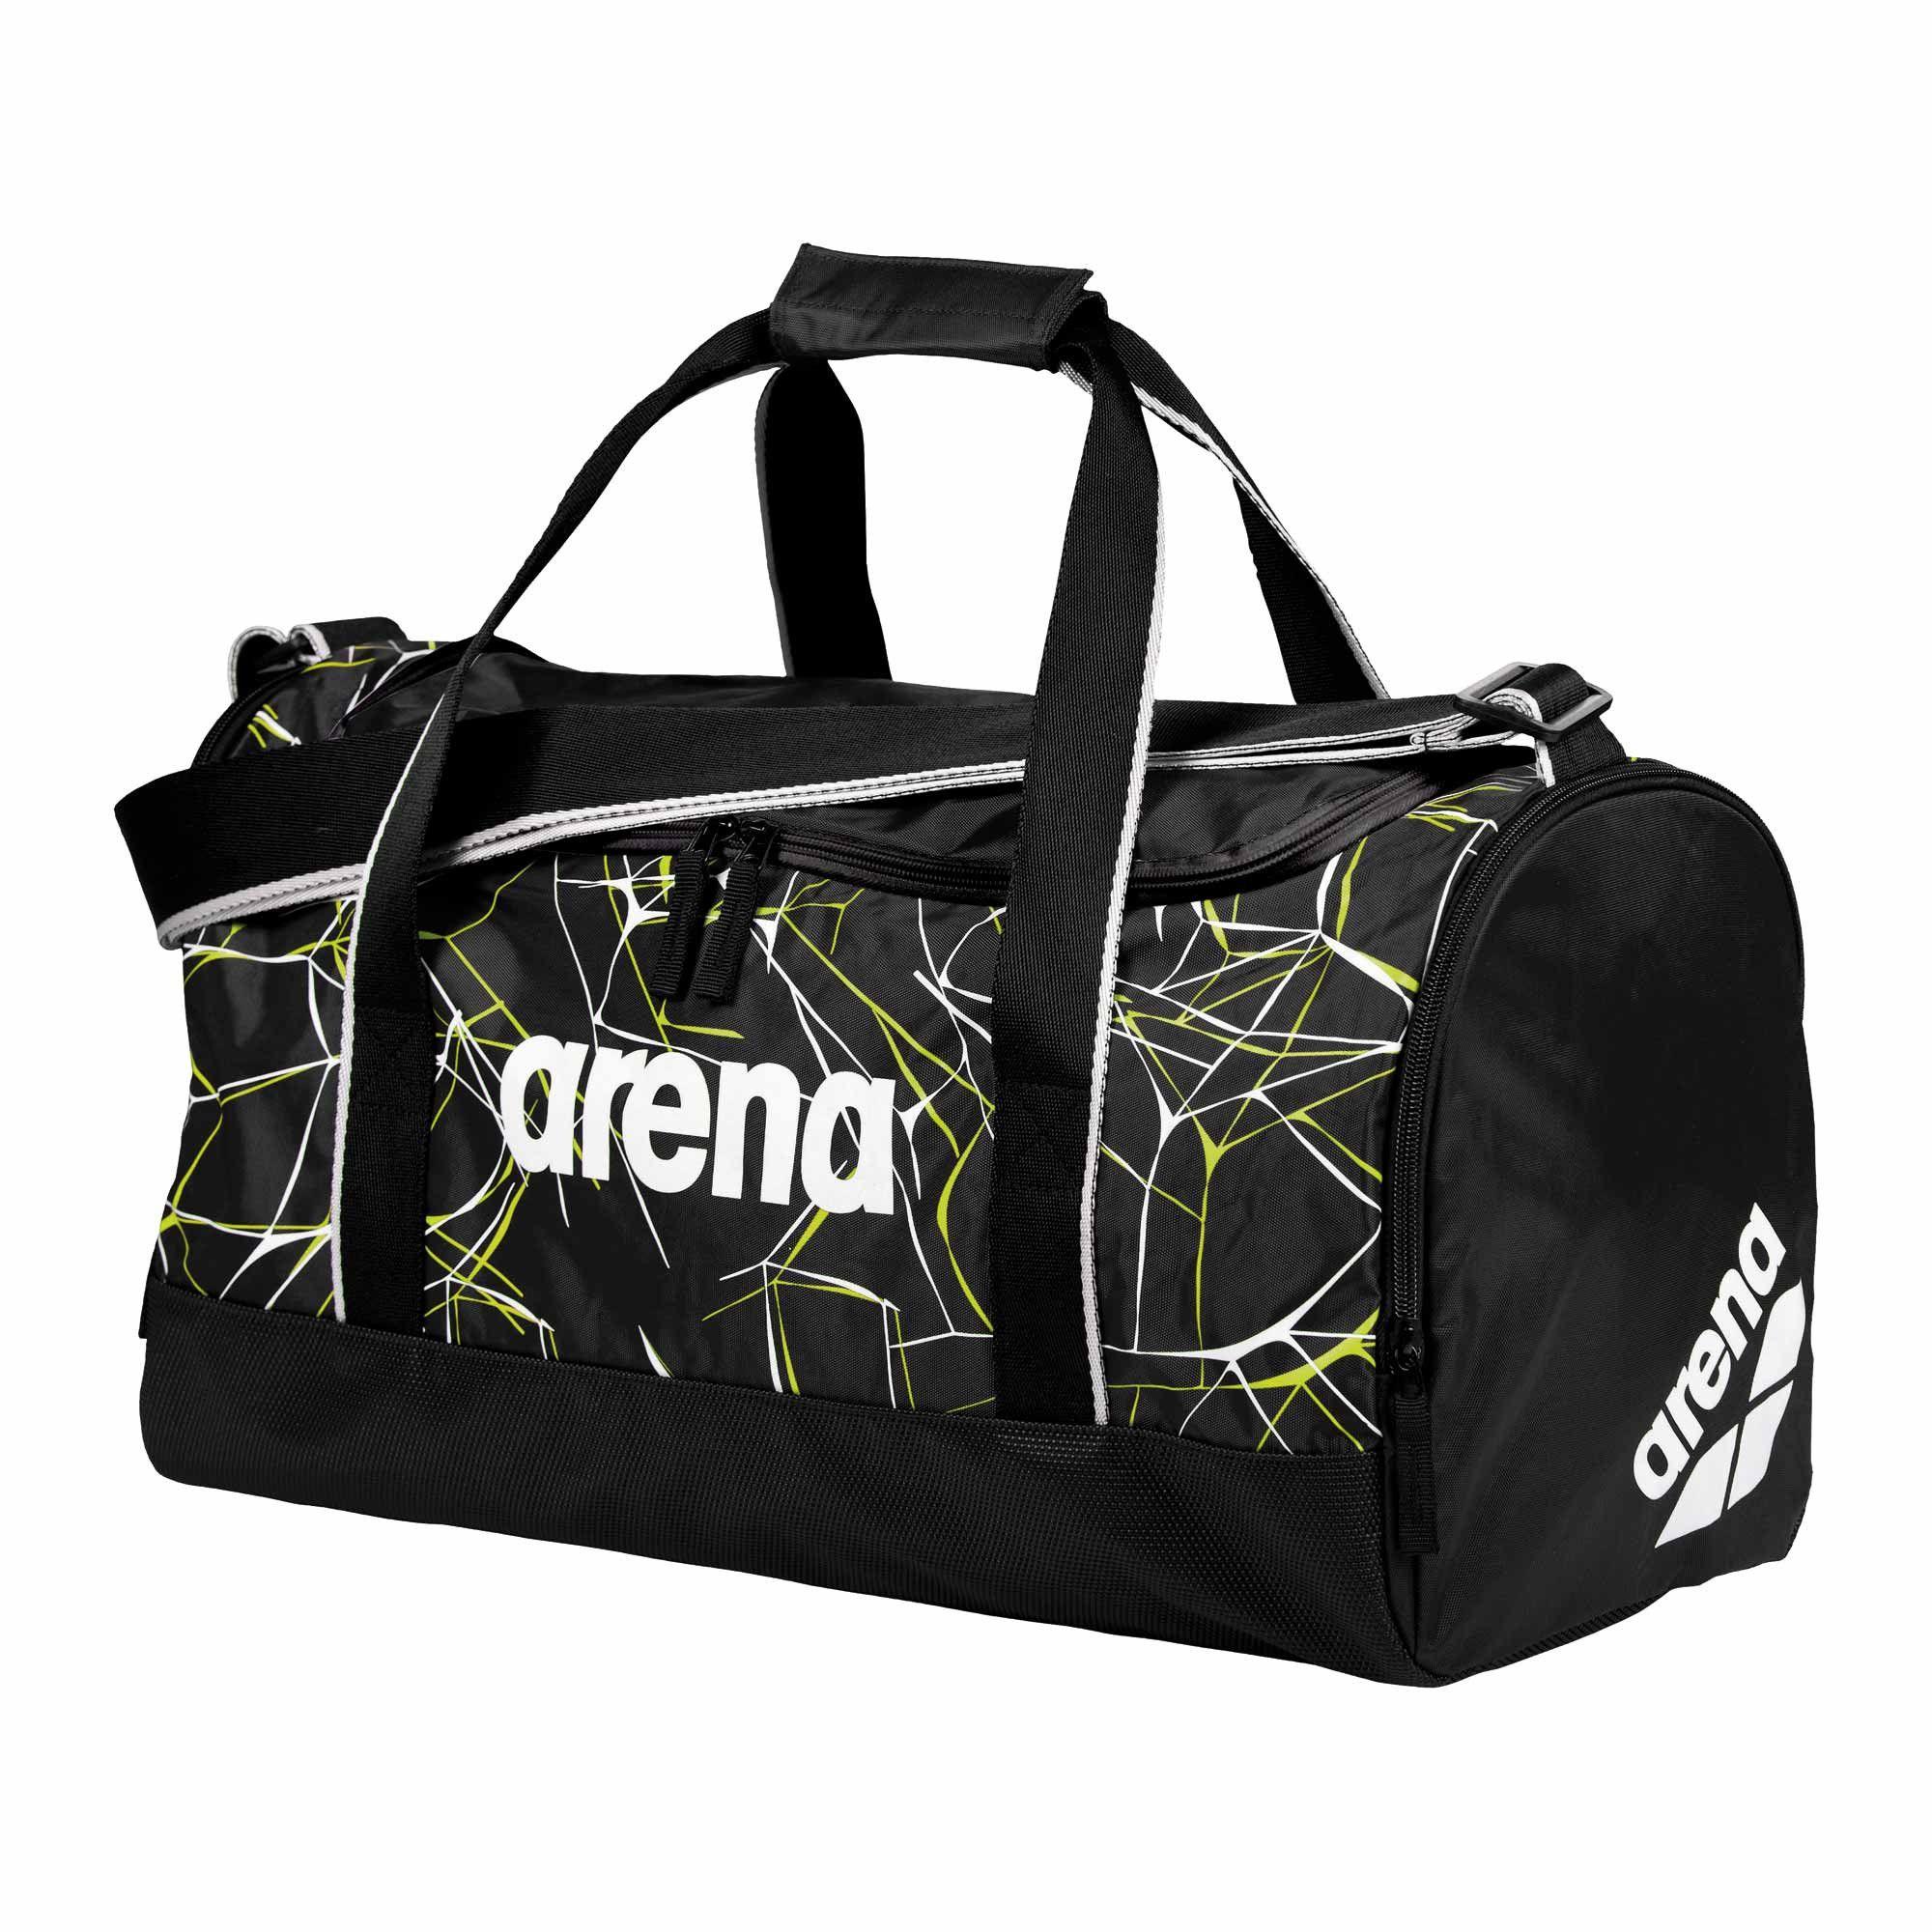 bb71476f0300 Spiky 2 Water Medium Bag   arena Bags   Bags, Medium bags, Medium